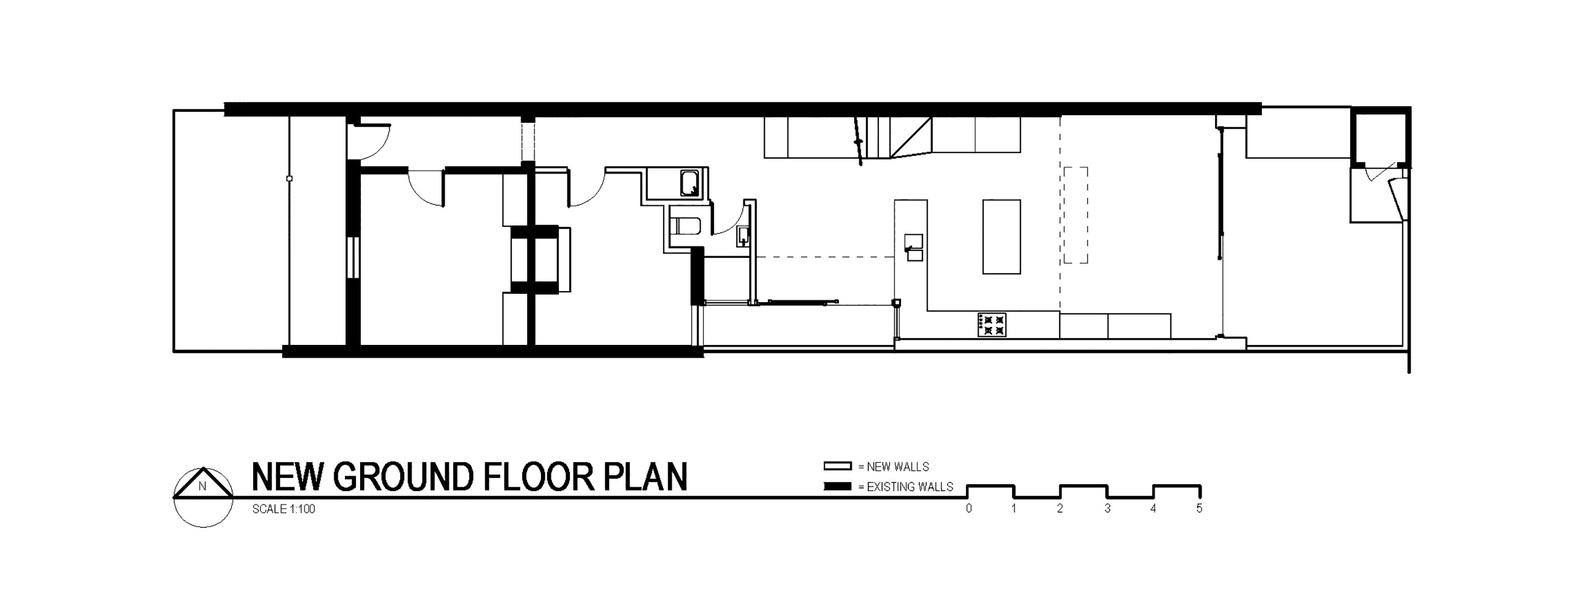 Big Little House Is A Modest But Light Filled Terrace